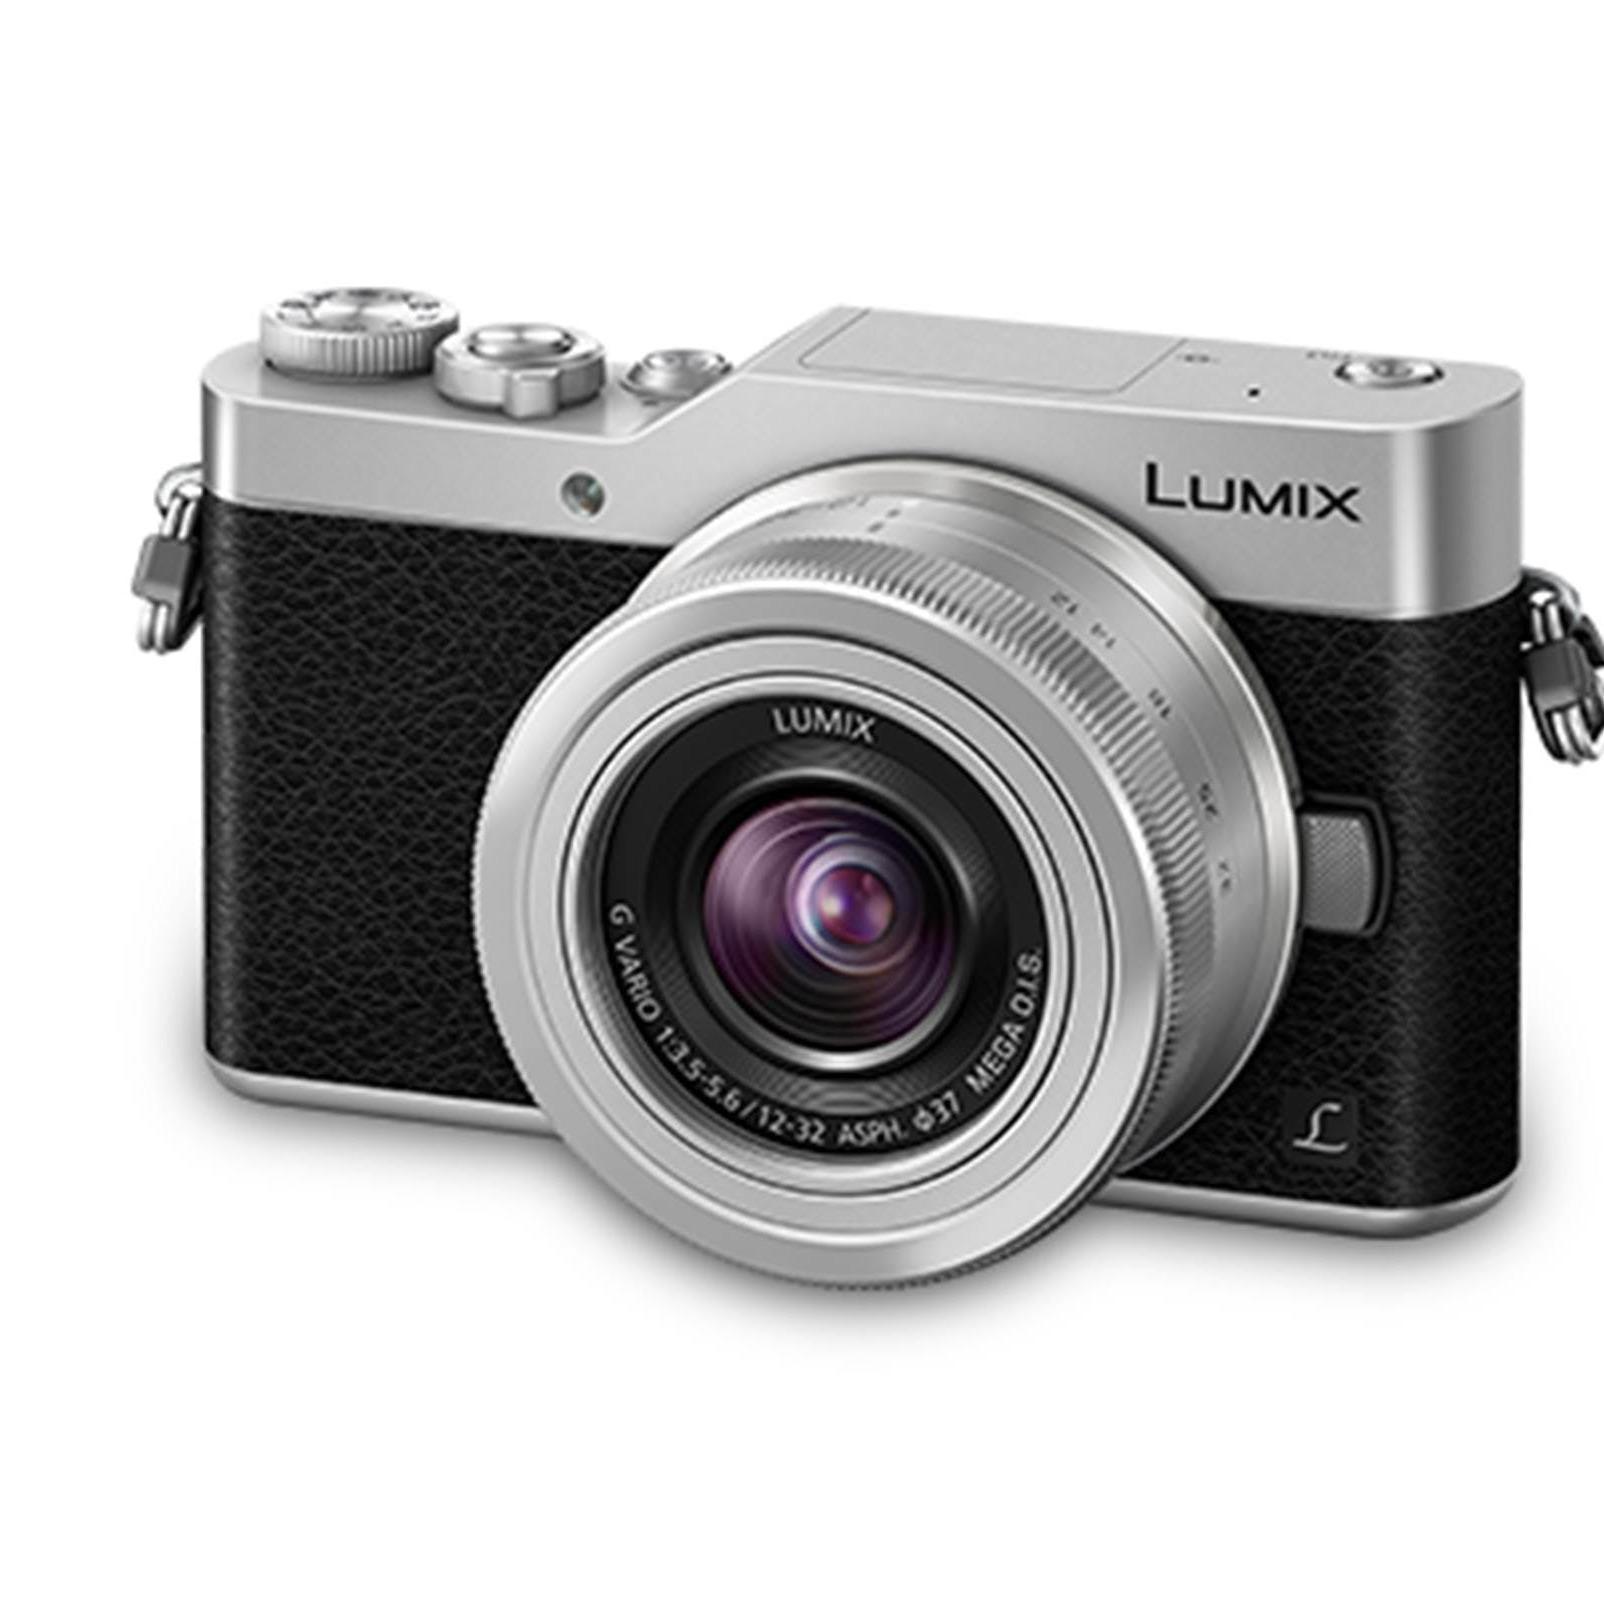 Panasonic DMC-GF9K Lumix Single Lens Mirrorless Digital Camera